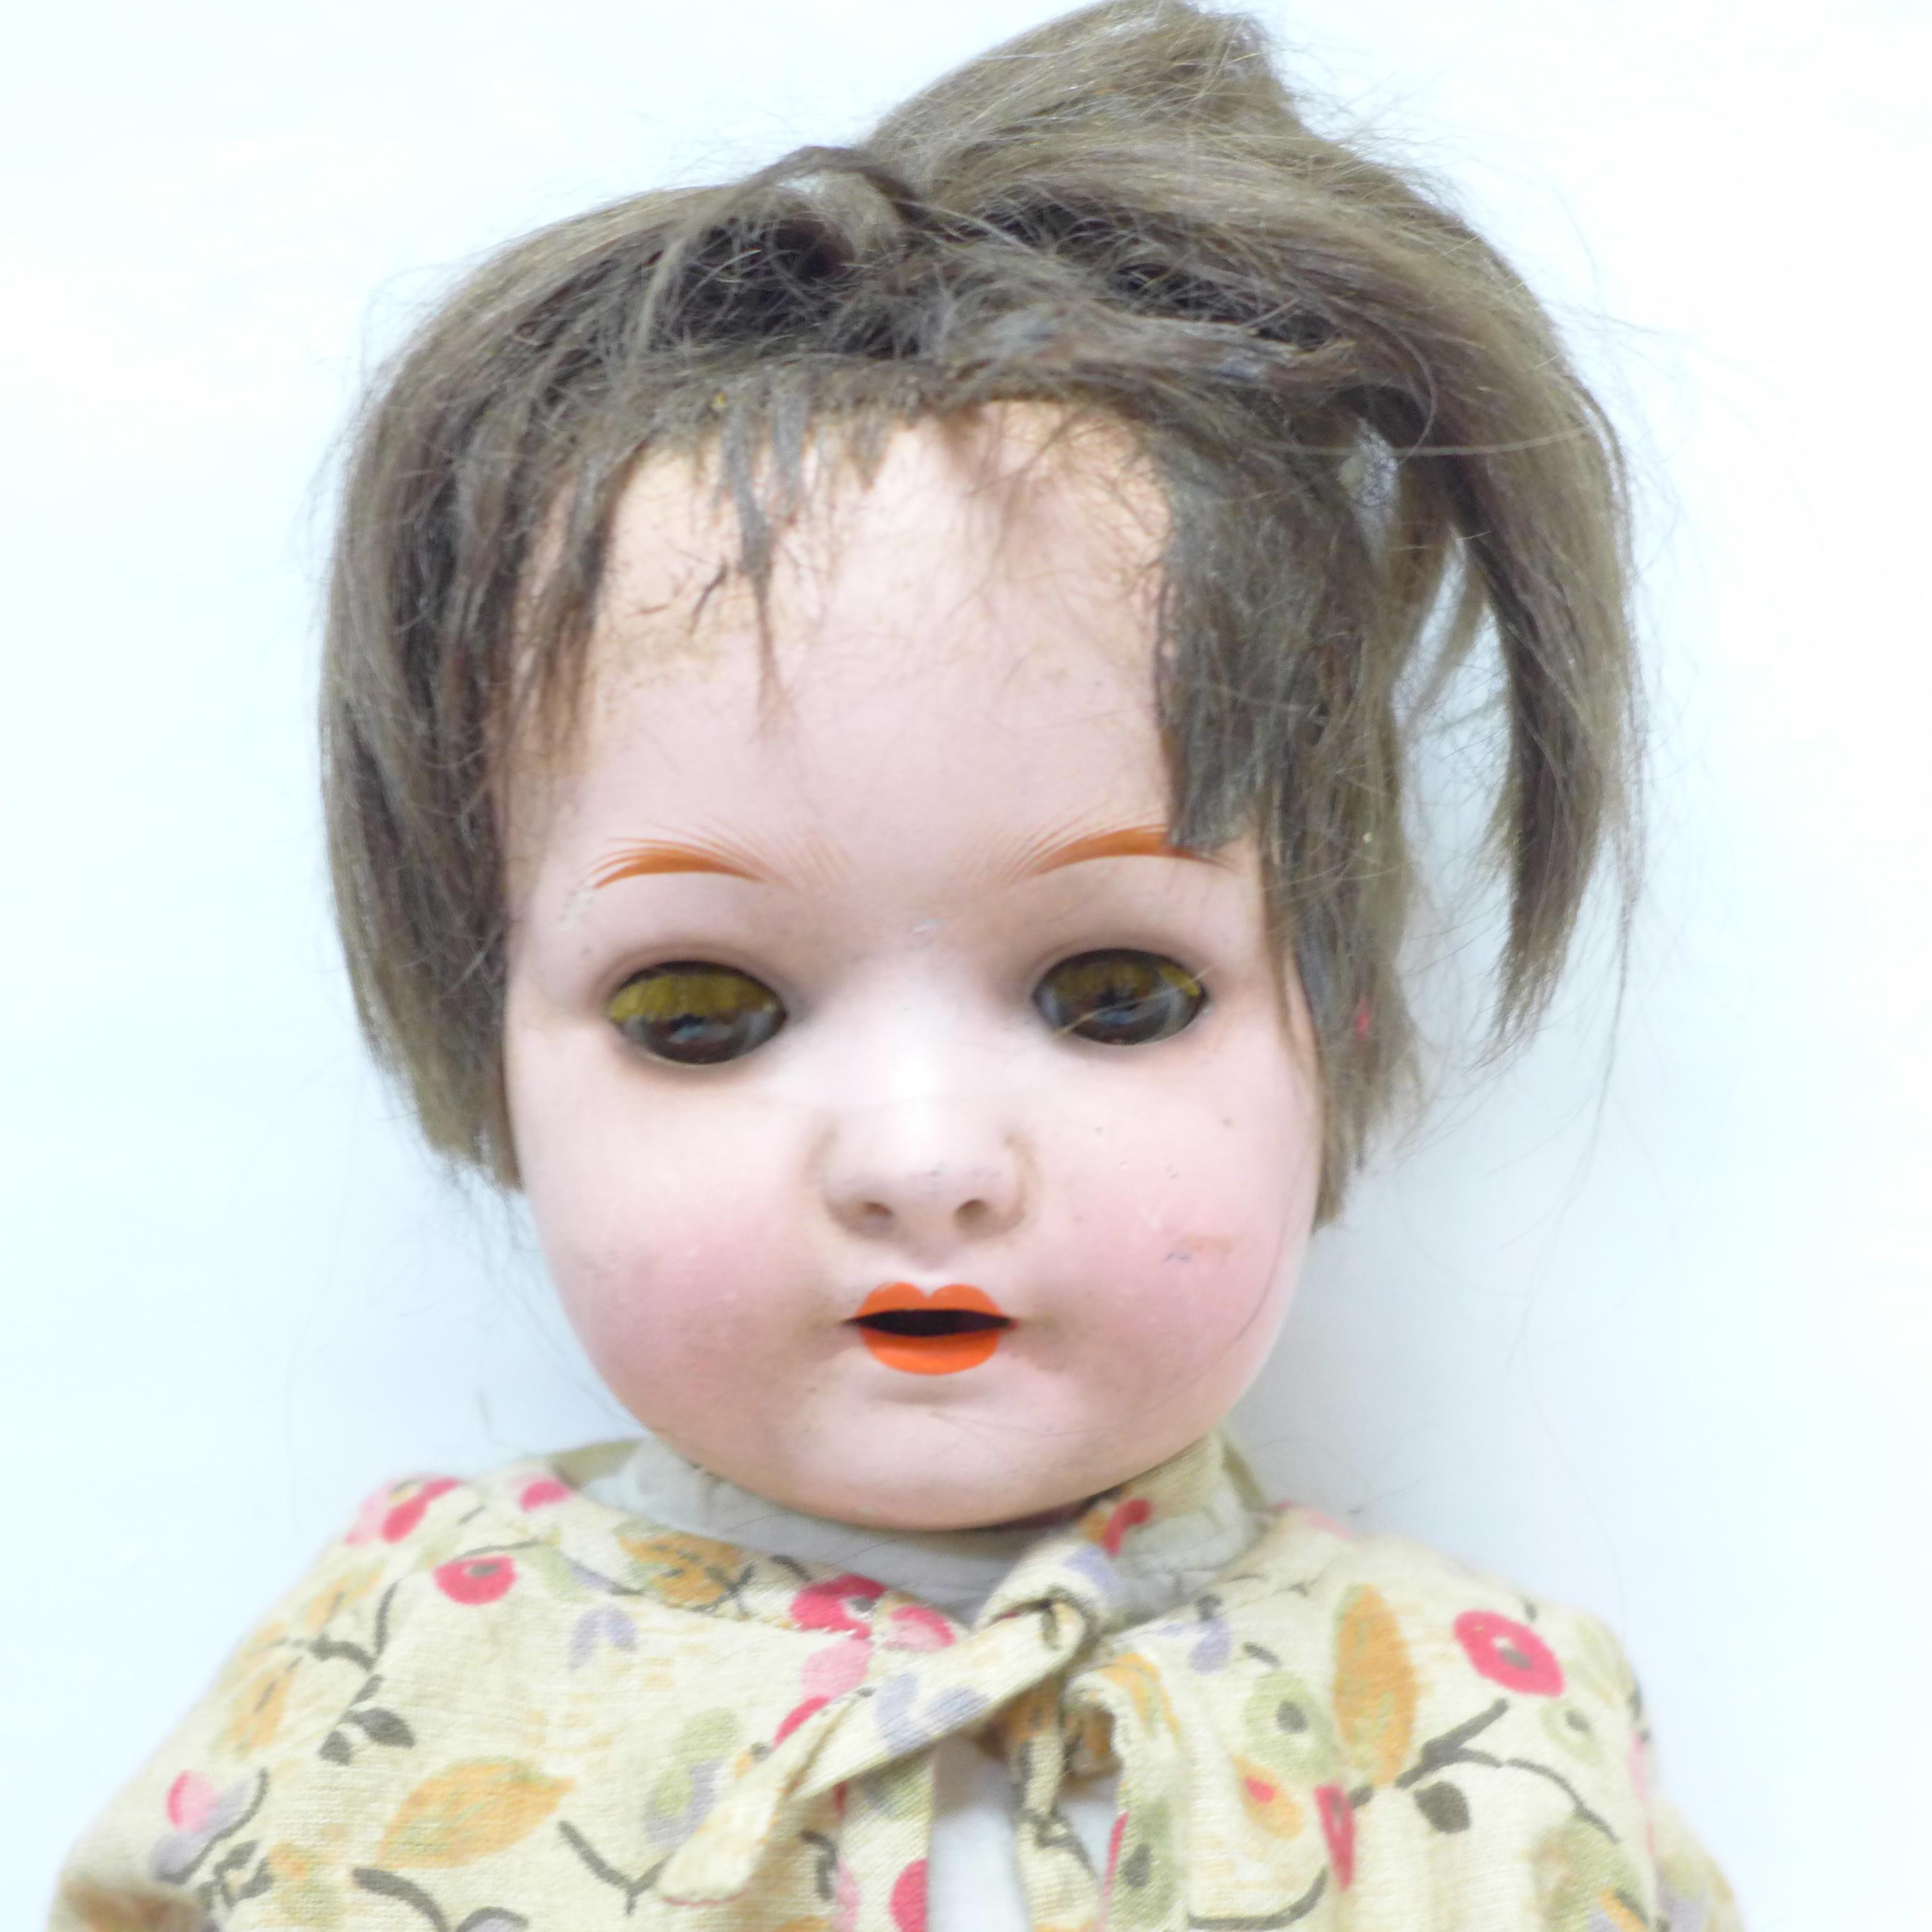 A Heubach Koppelsdorf doll, 320.2/0, 37cm - Image 2 of 6